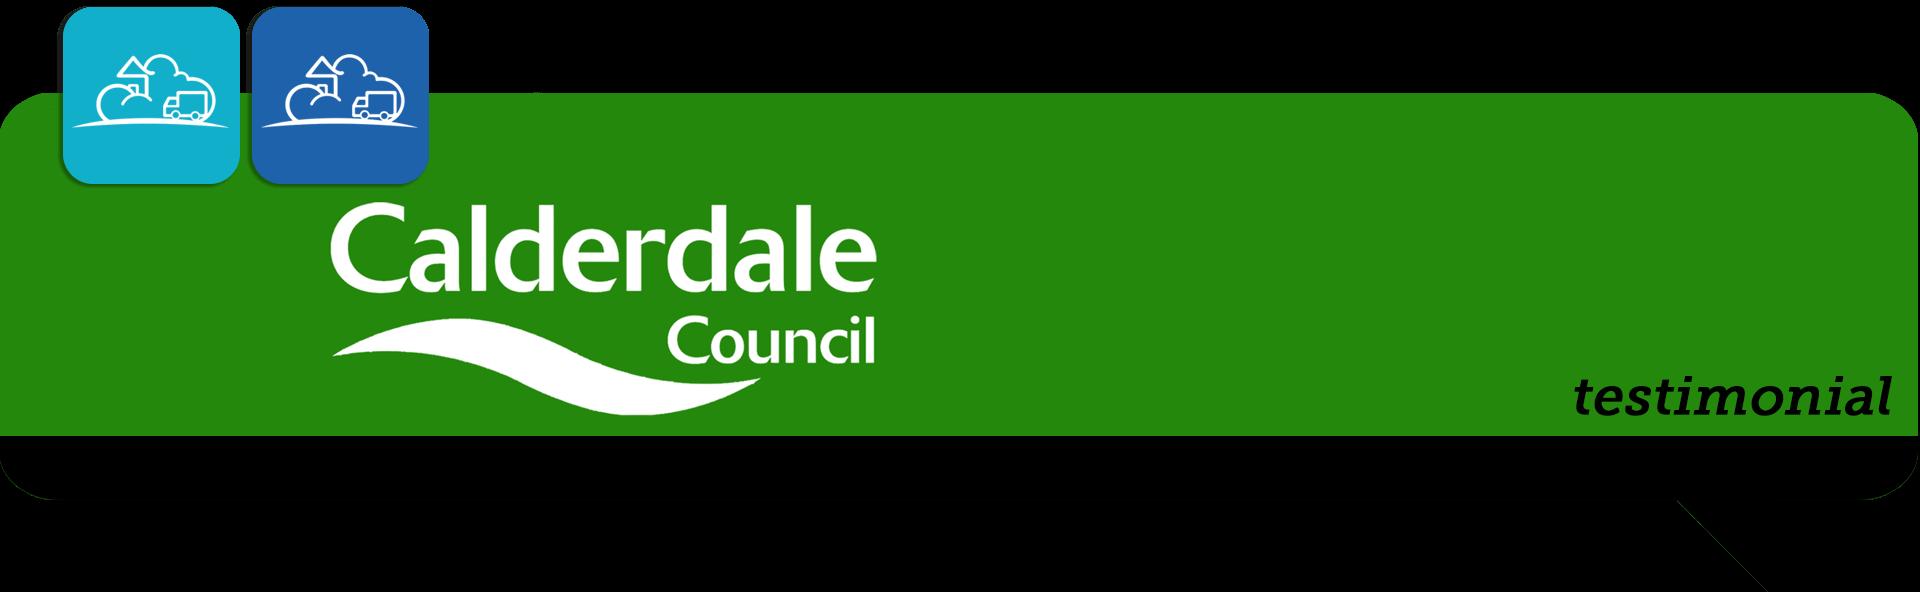 calderdale council testimonial speech bubble banner